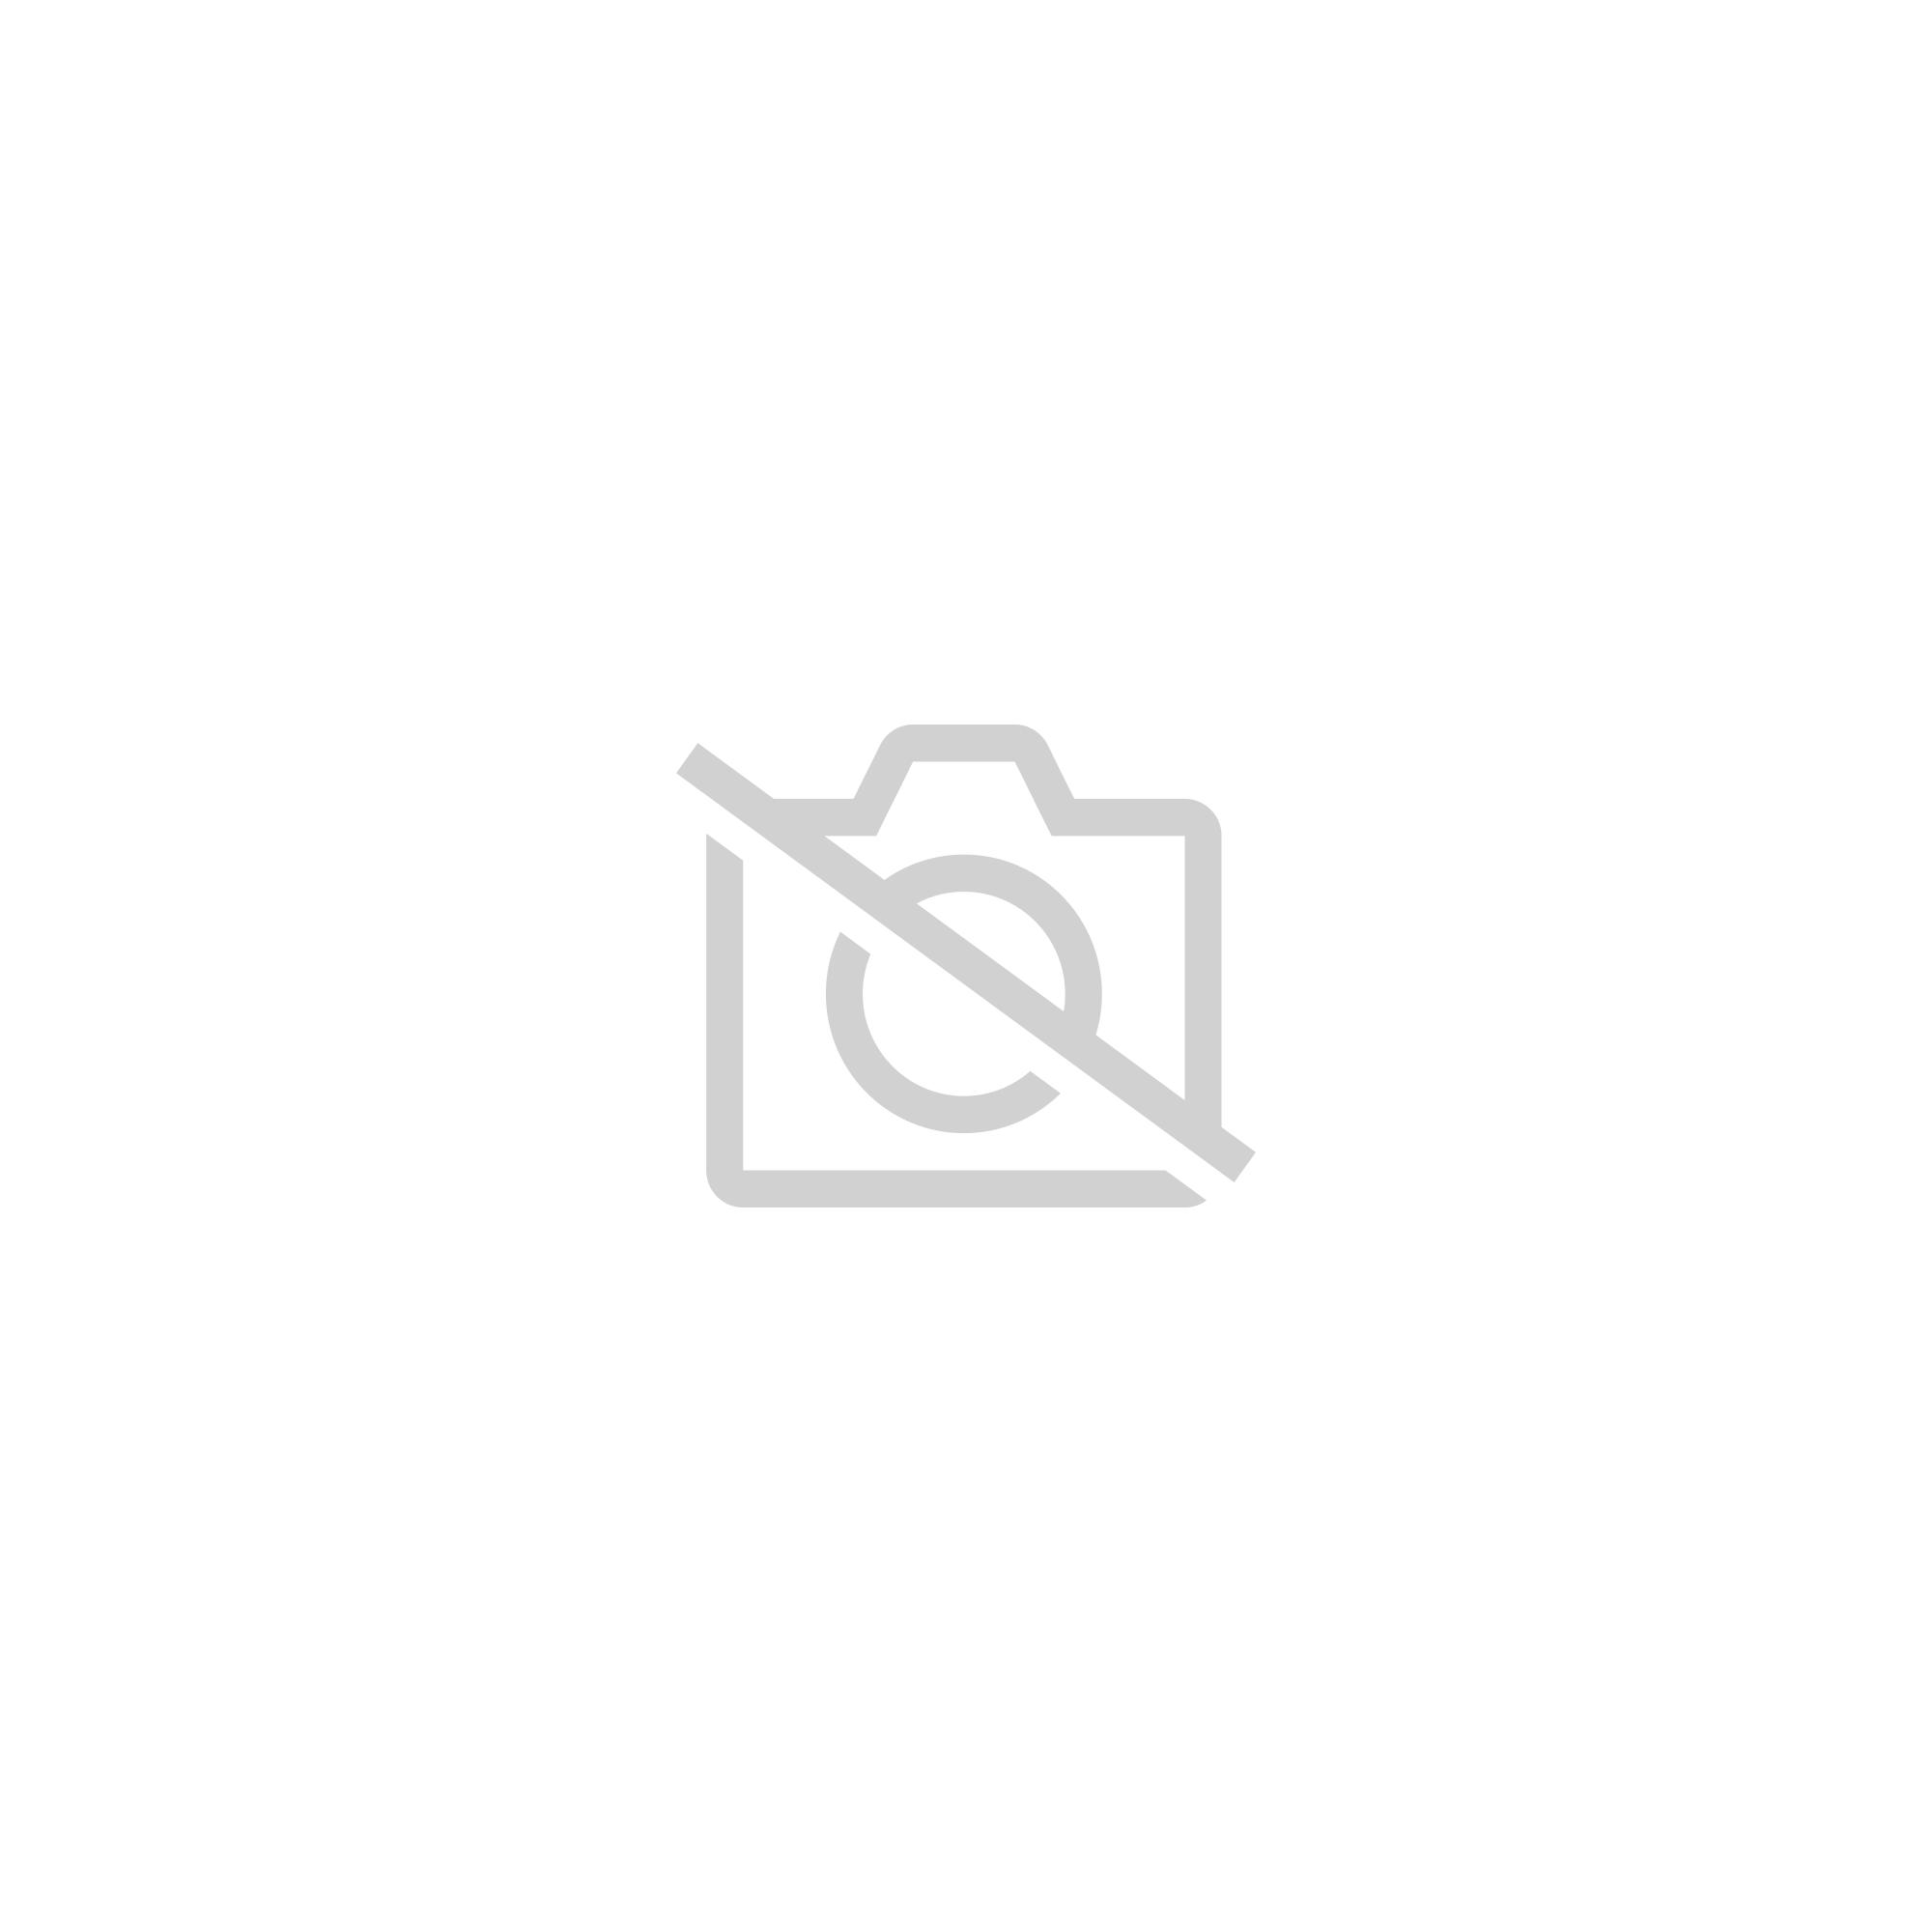 Retyly Kit de fer /à souder USB 5 V 8 W avec indicateur LED